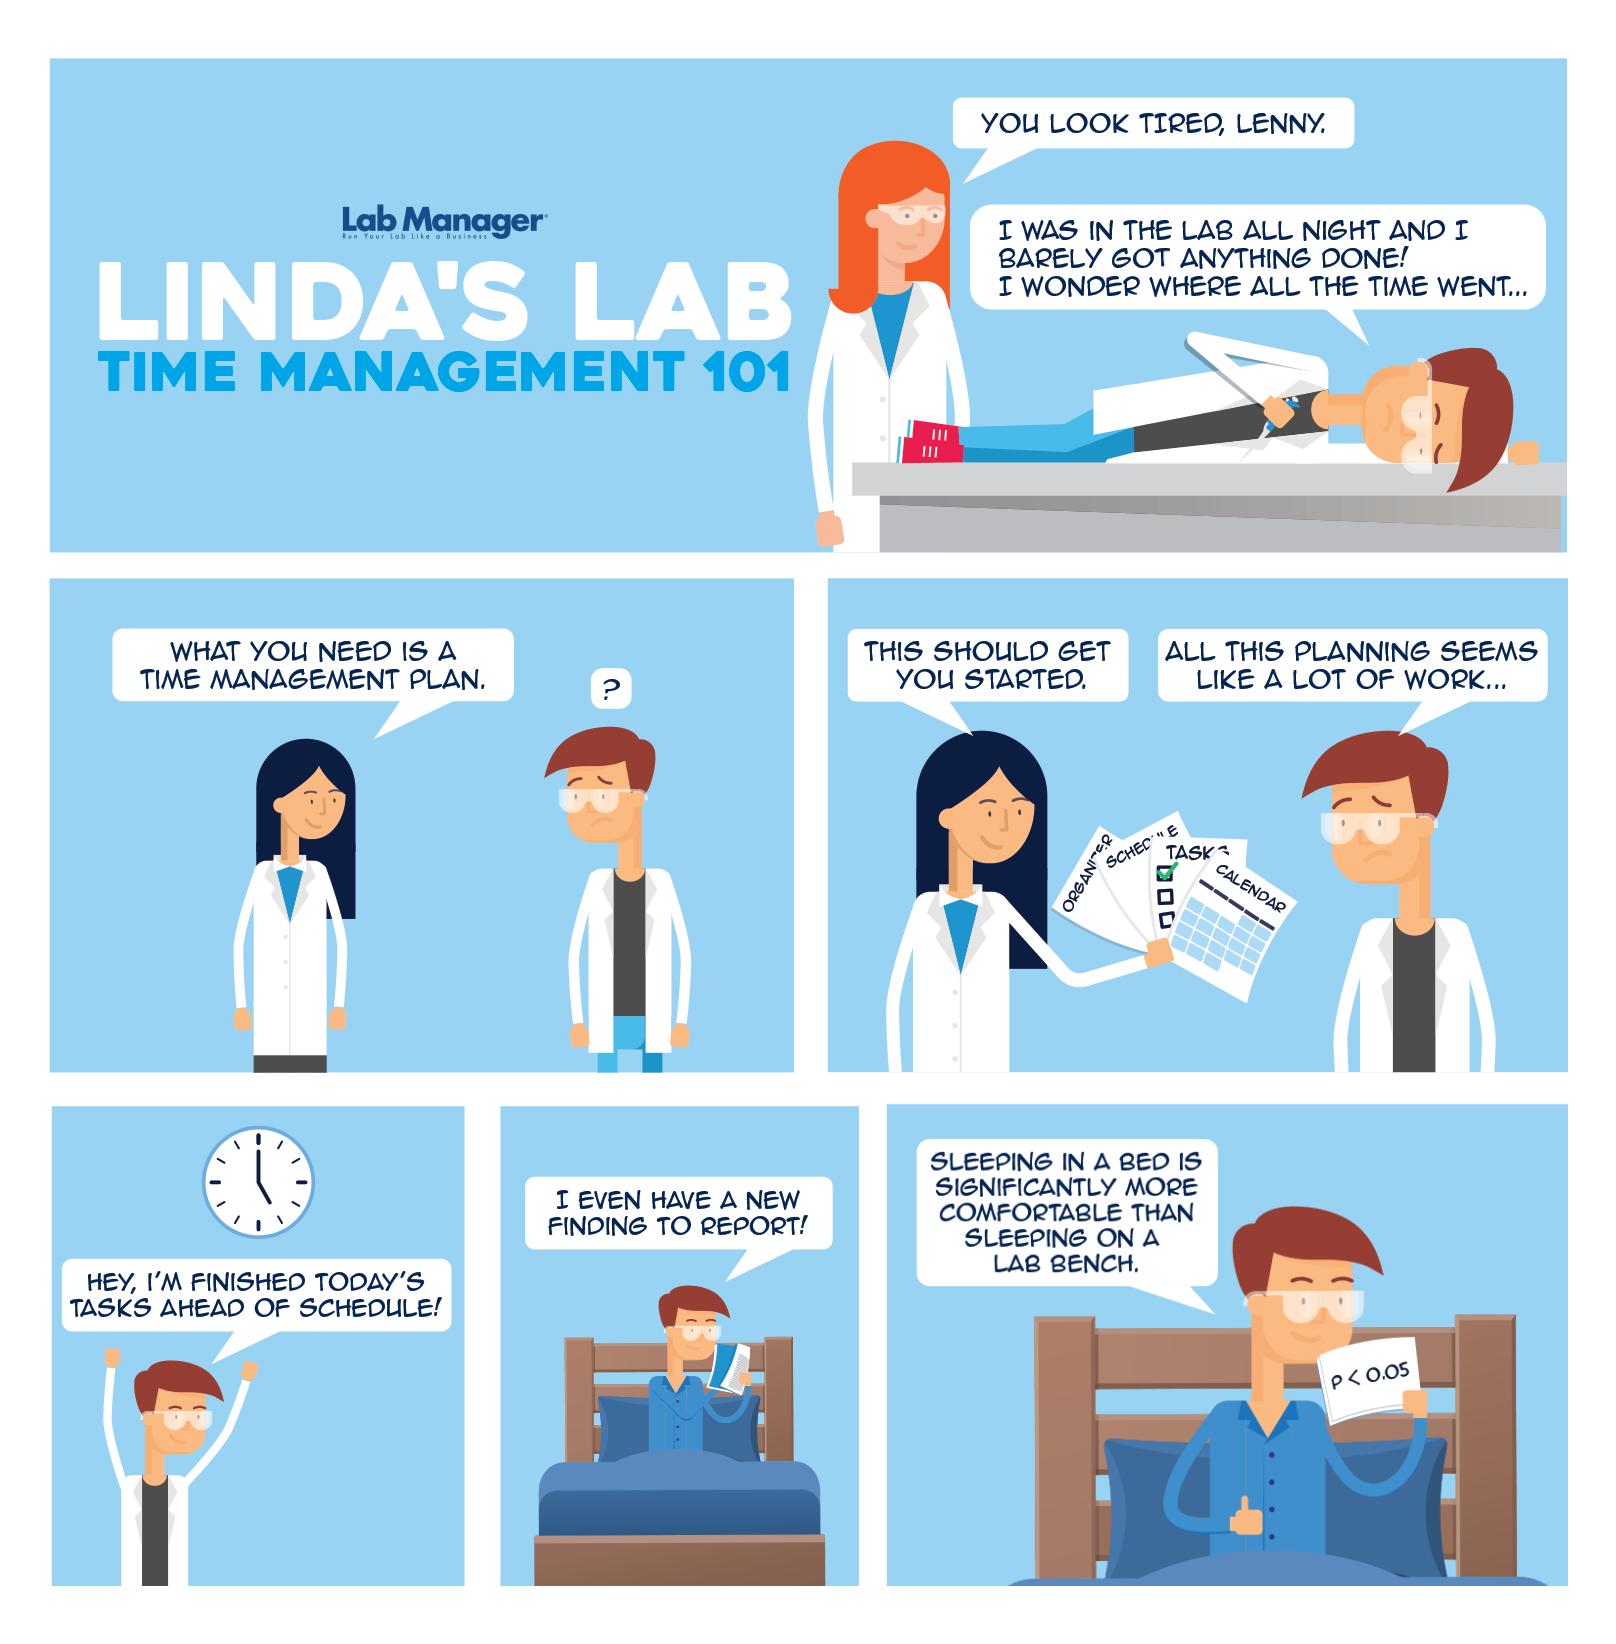 Linda's Lab: Time Management 101